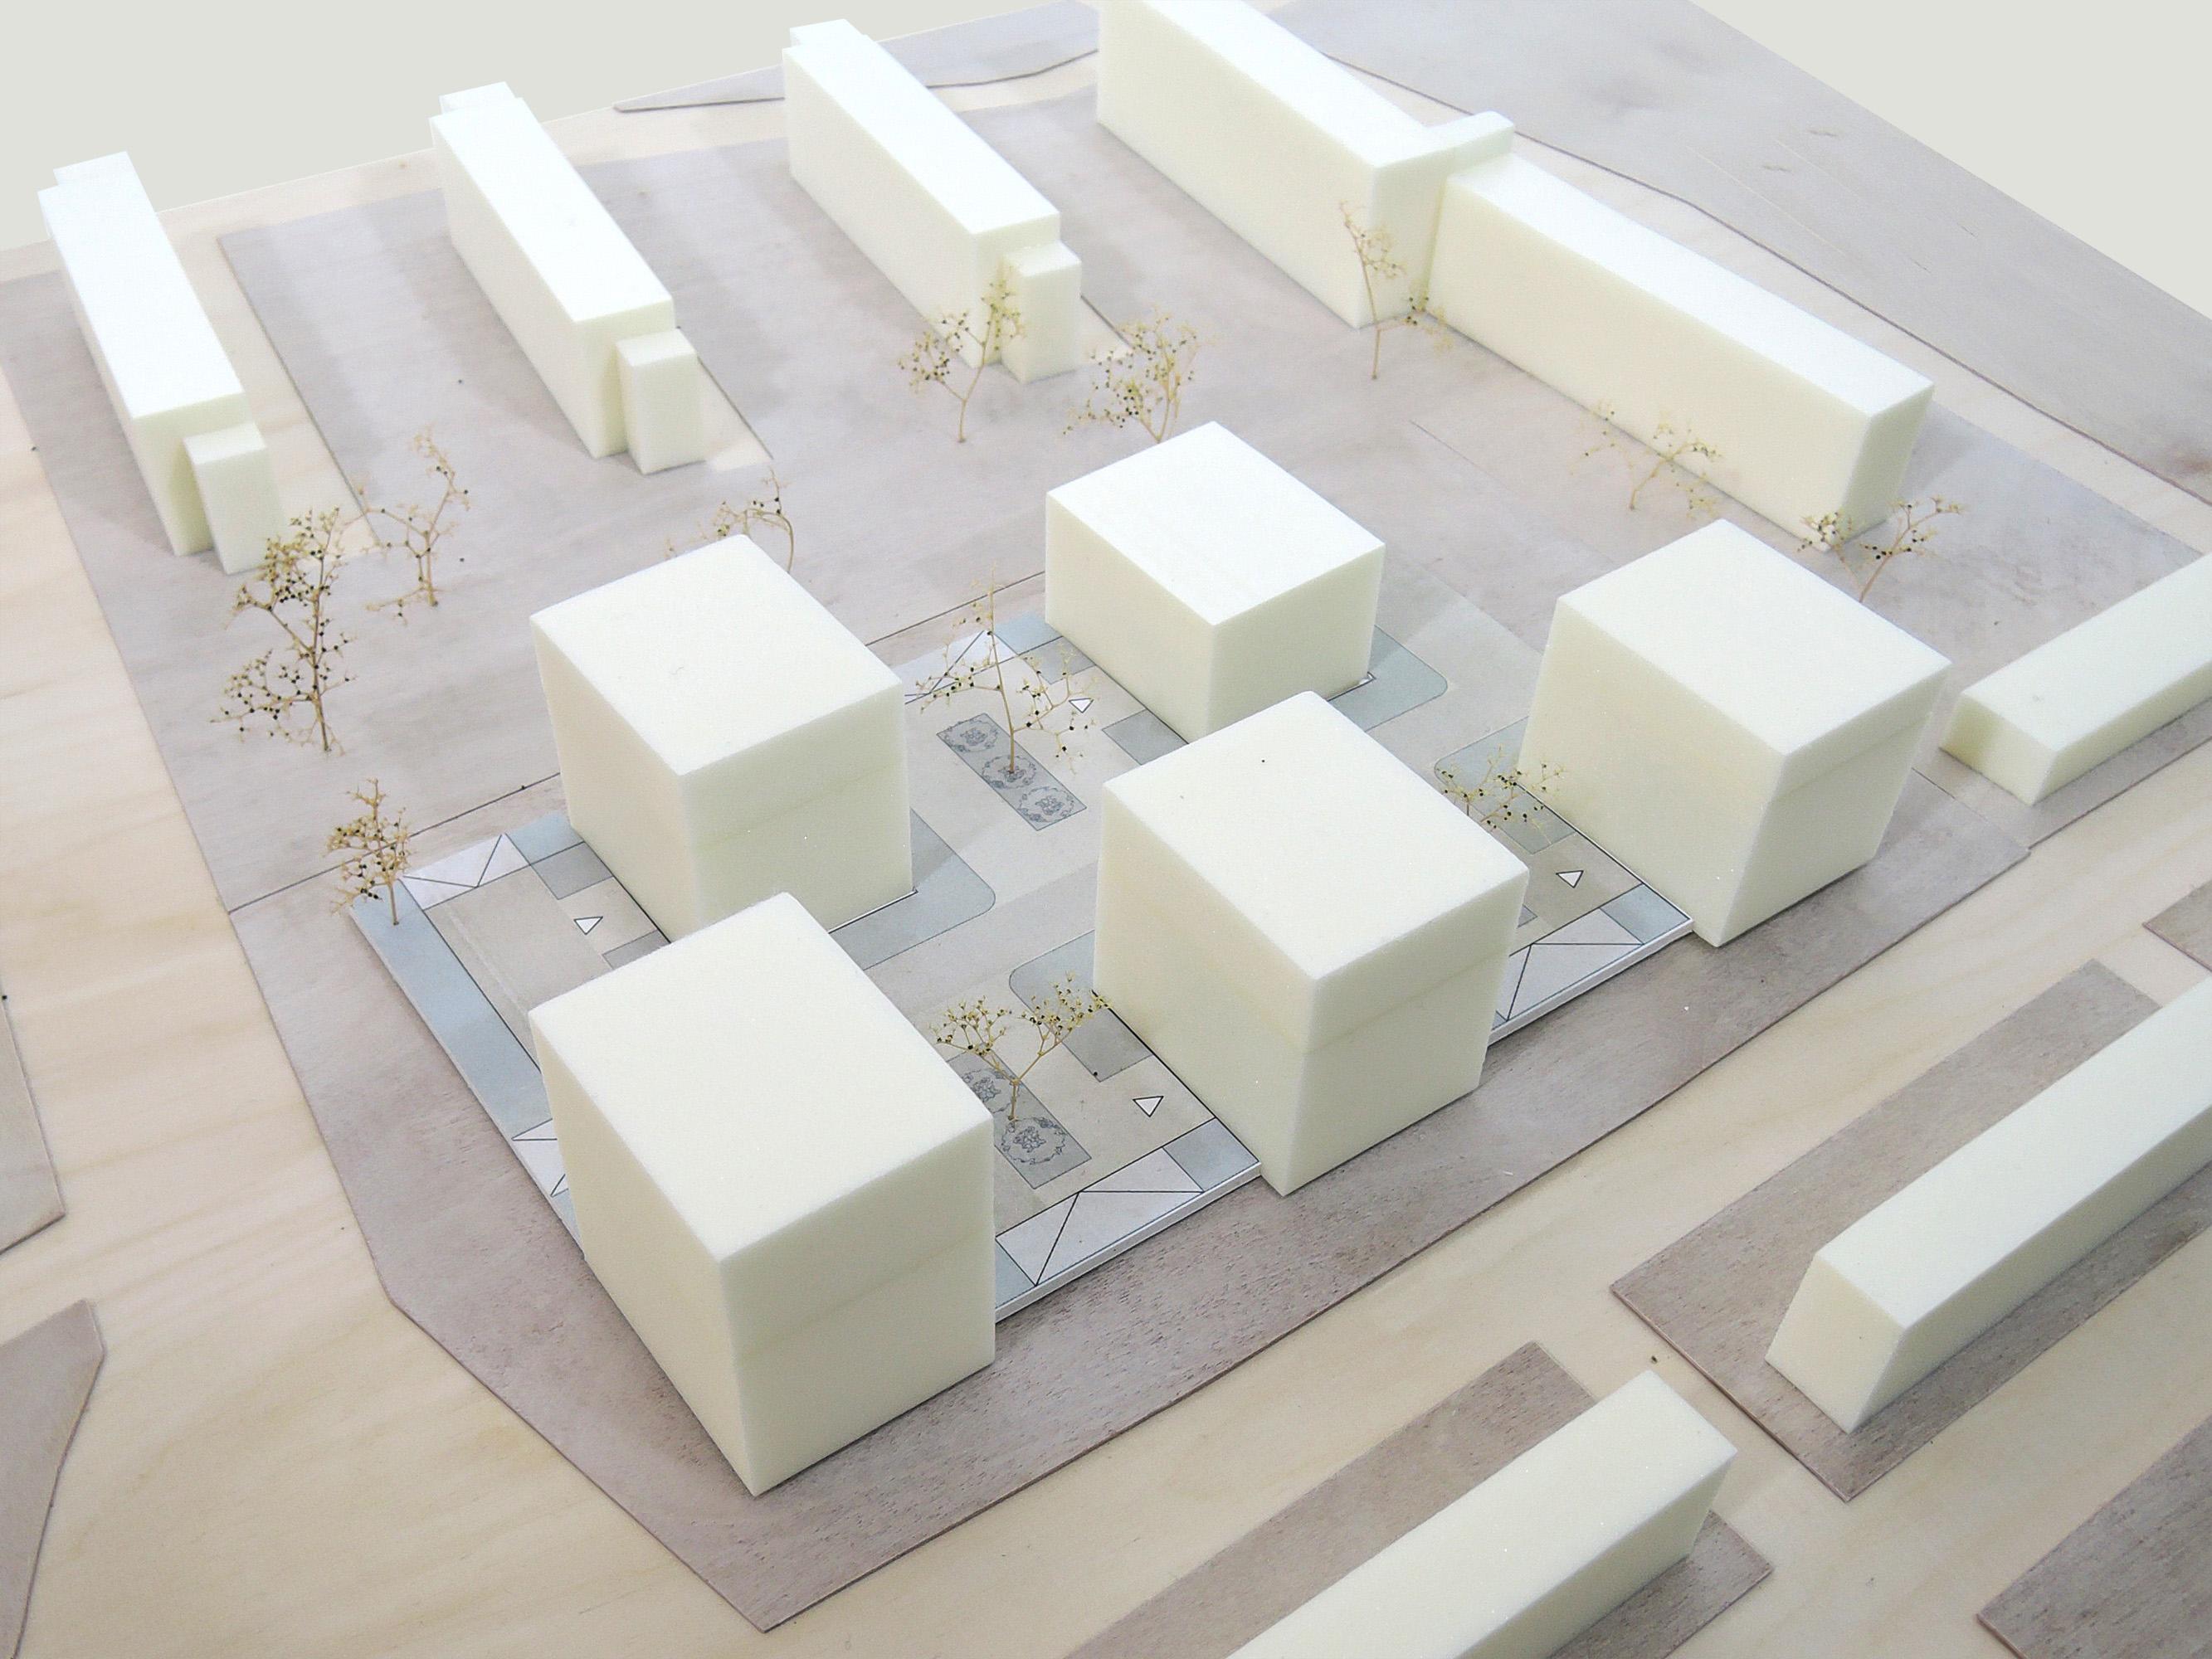 Lindenlaan maquette 2a